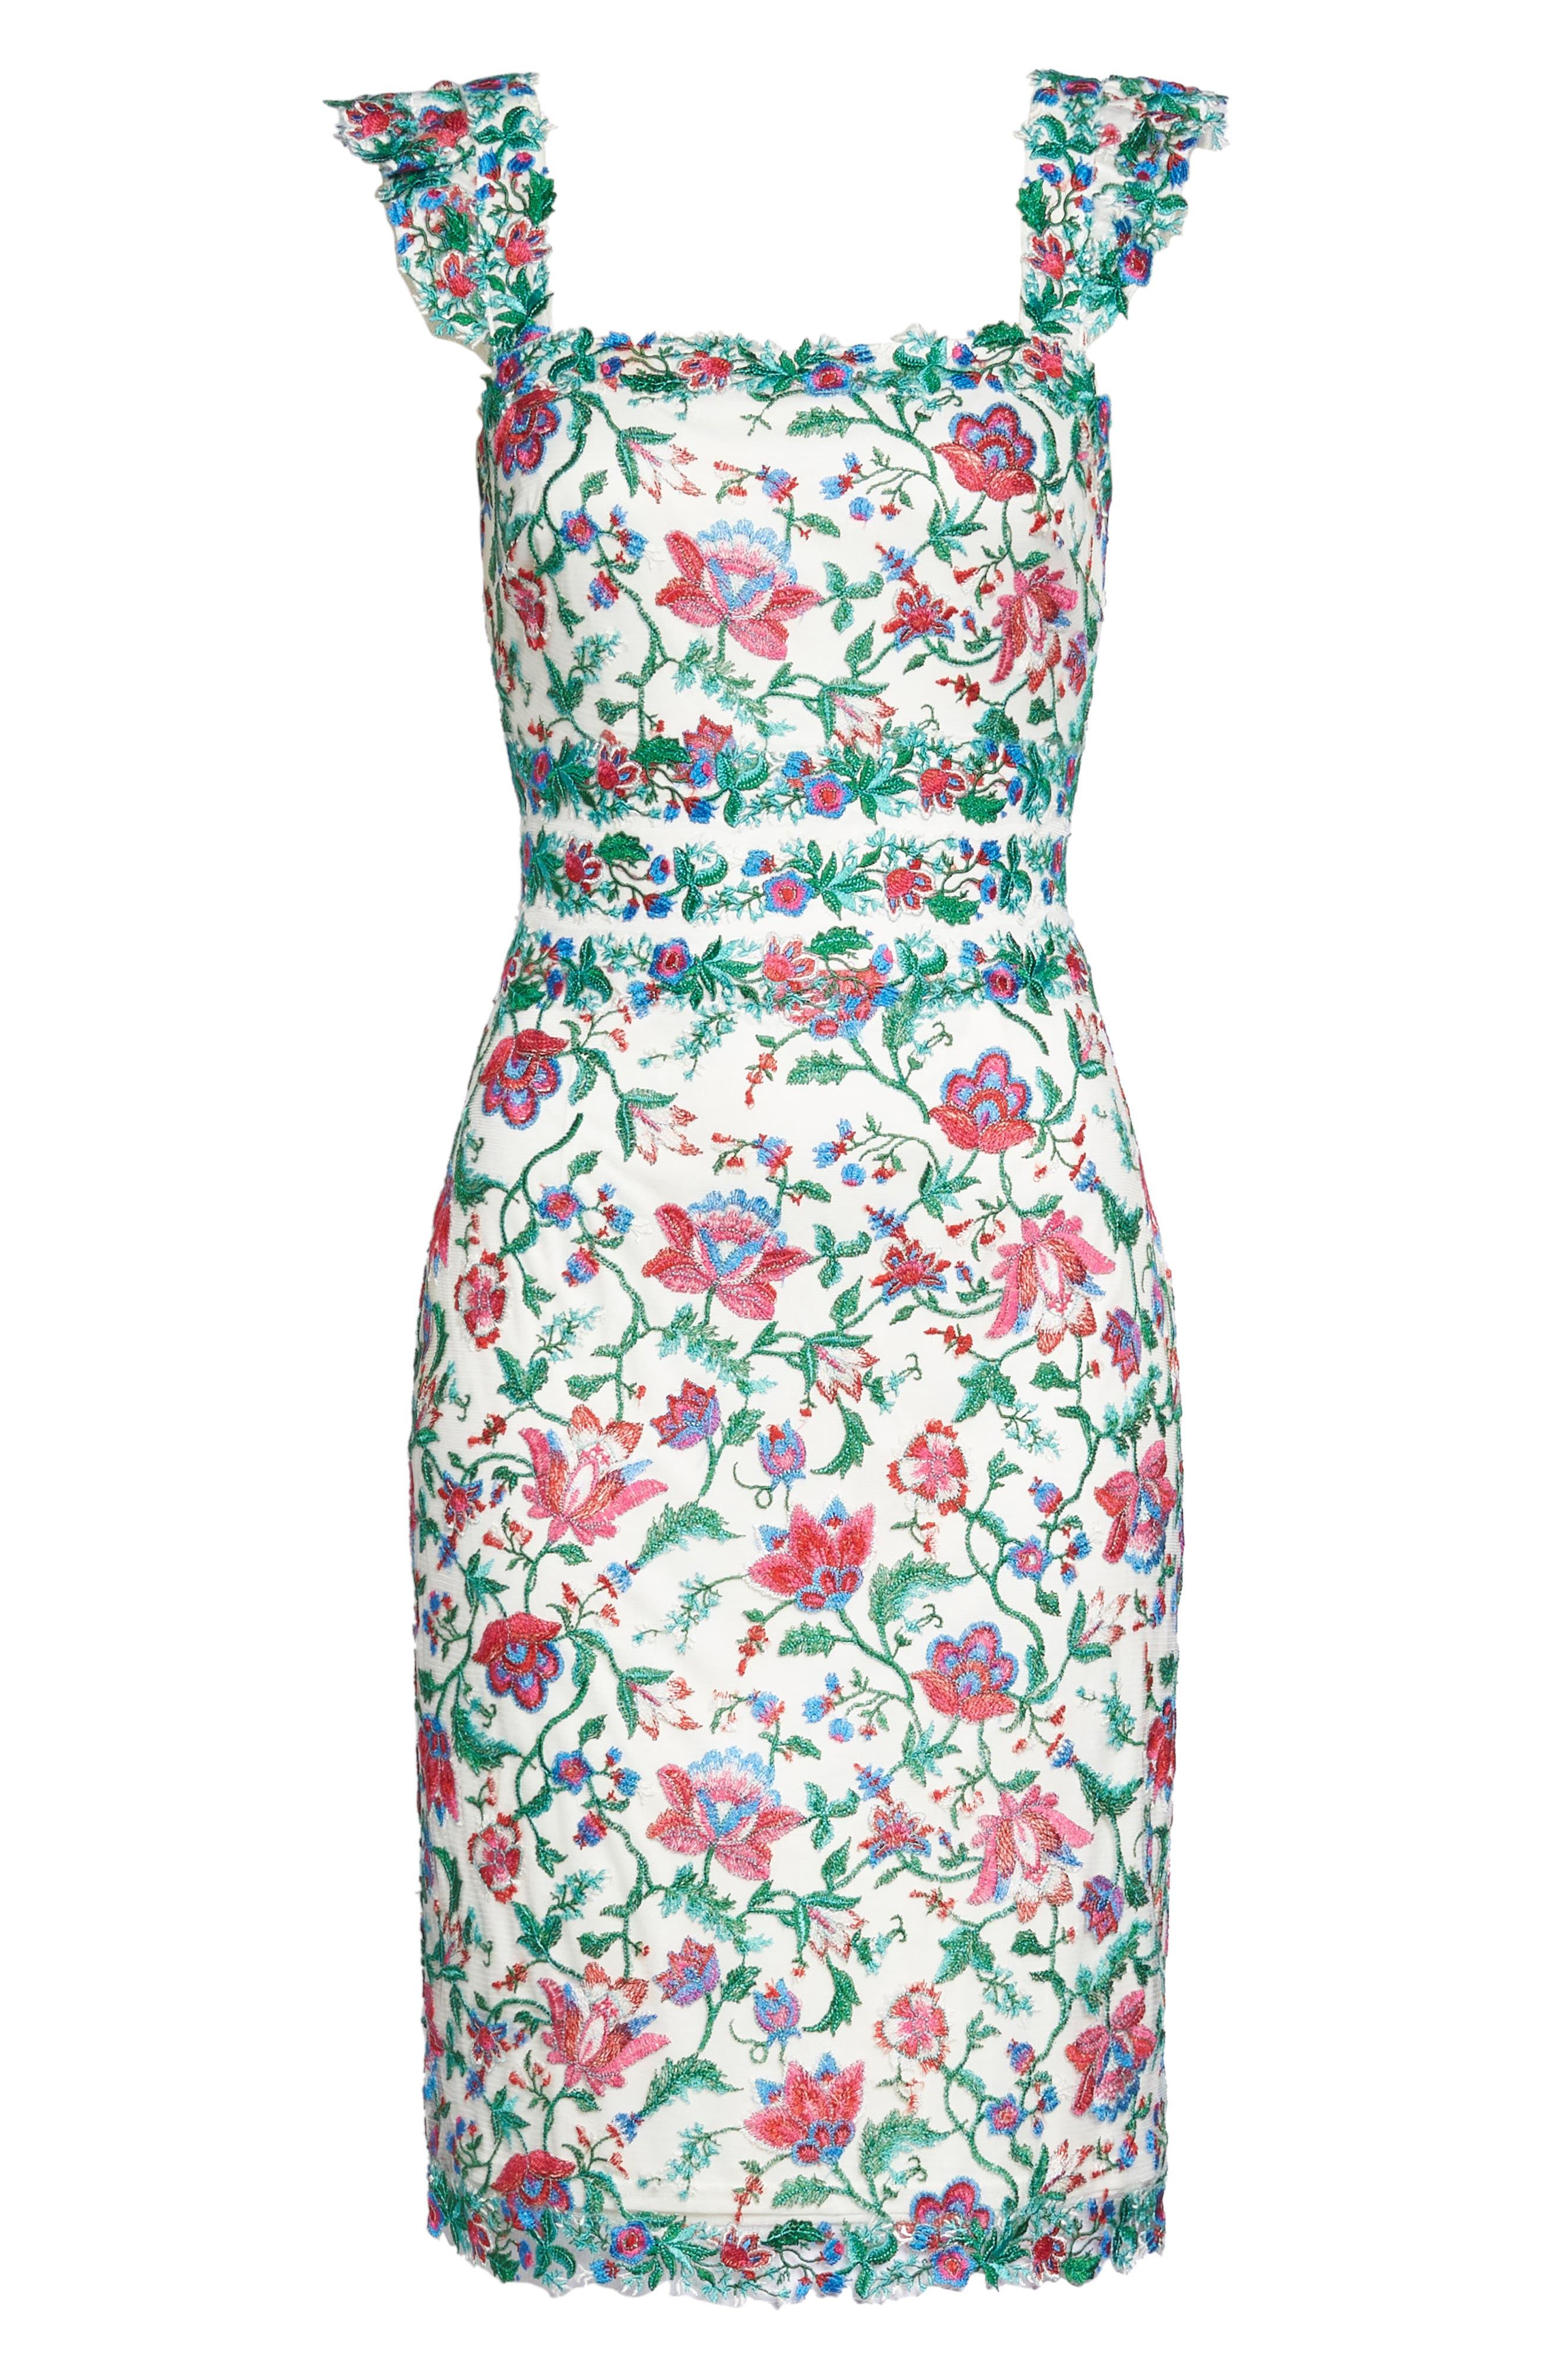 Ximena Embroidered Sheath Dress,                             Alternate thumbnail 6, color,                             White/ Dahlia